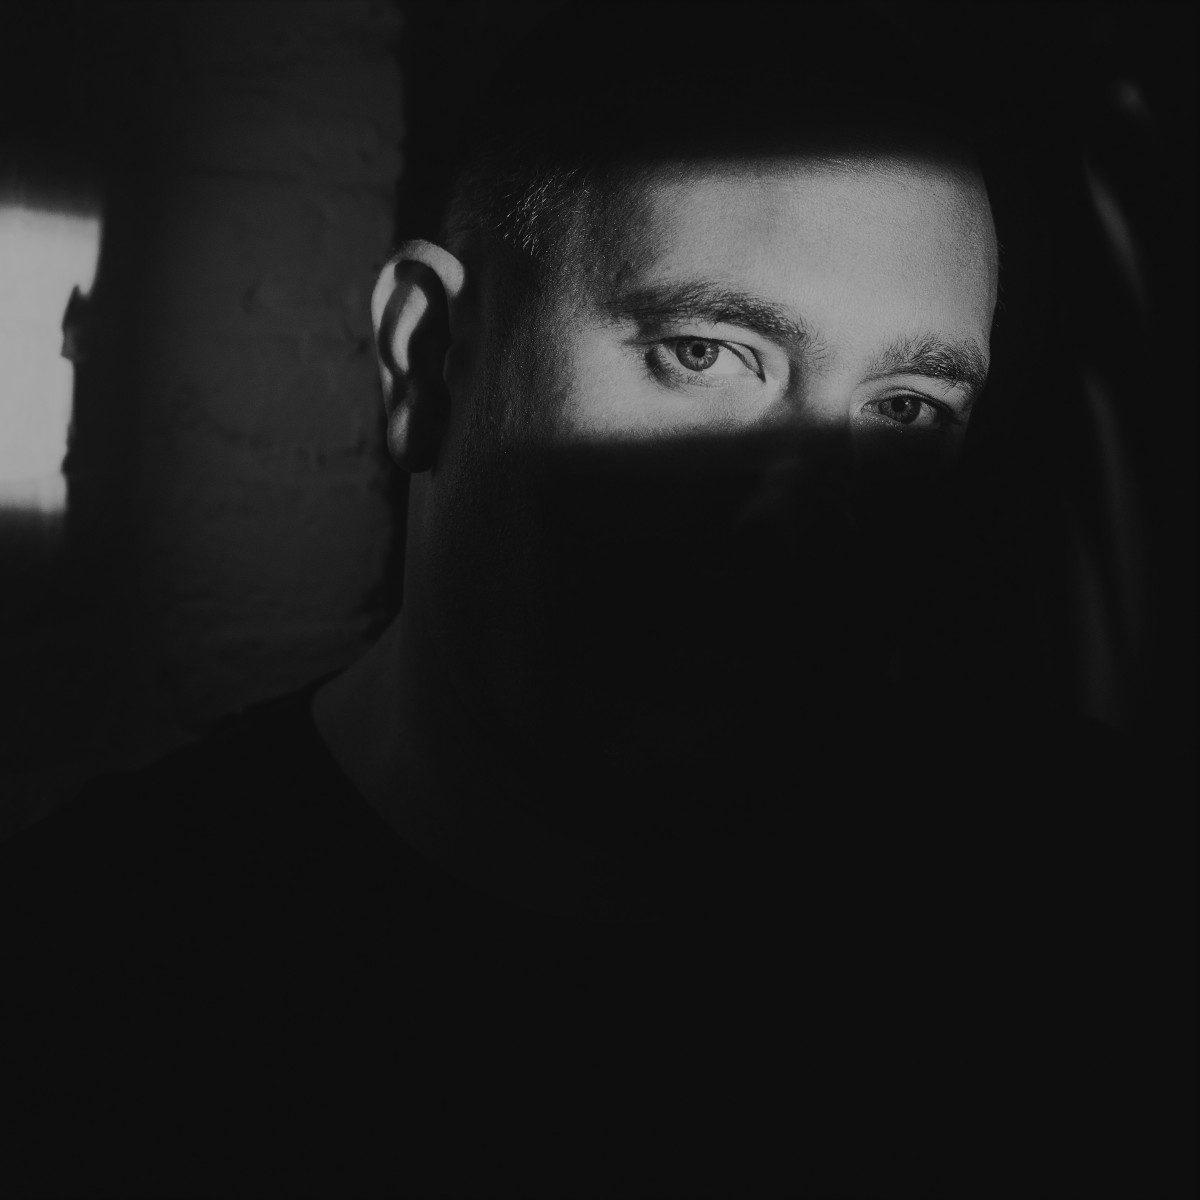 Belgian electro act Cubic reshapes latest 808 DOT POP album into 'The Cubic Temperature' - exclusive Bandcamp megamix bonus track